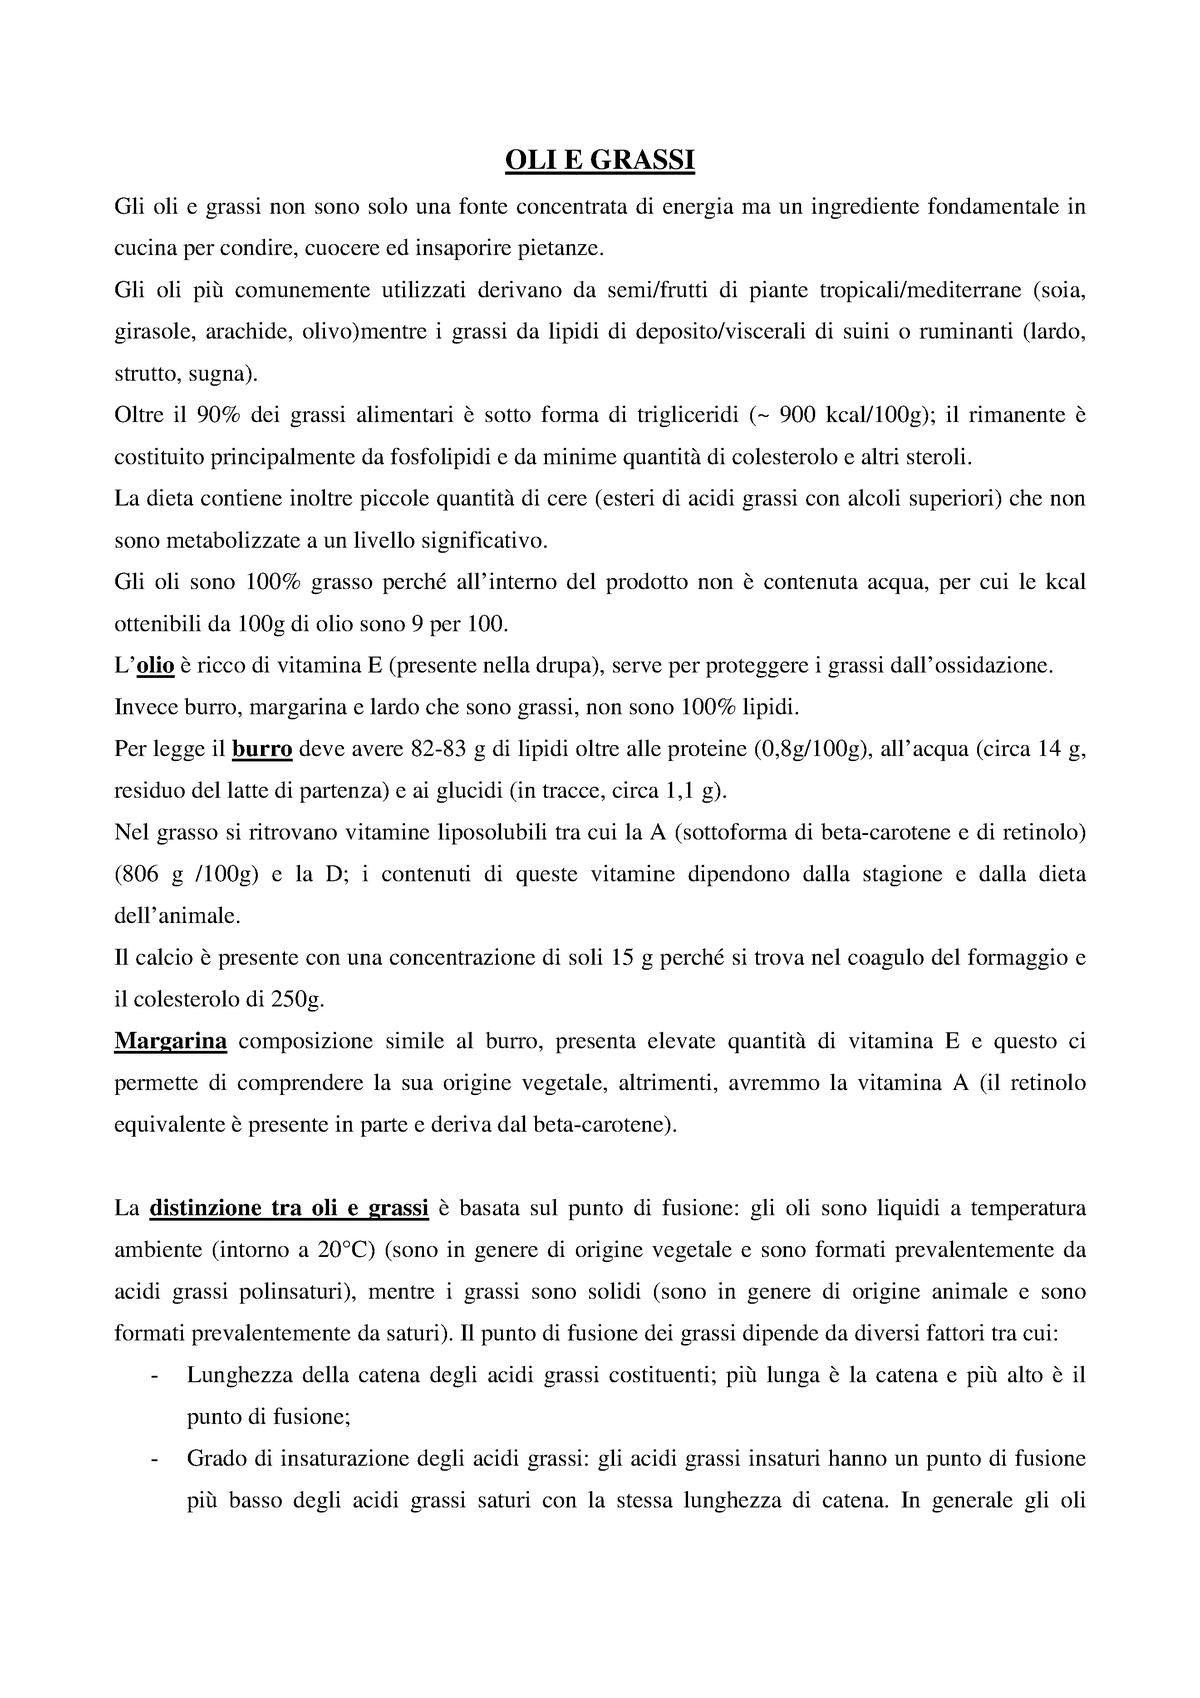 dieta generale dei liquidi pdf